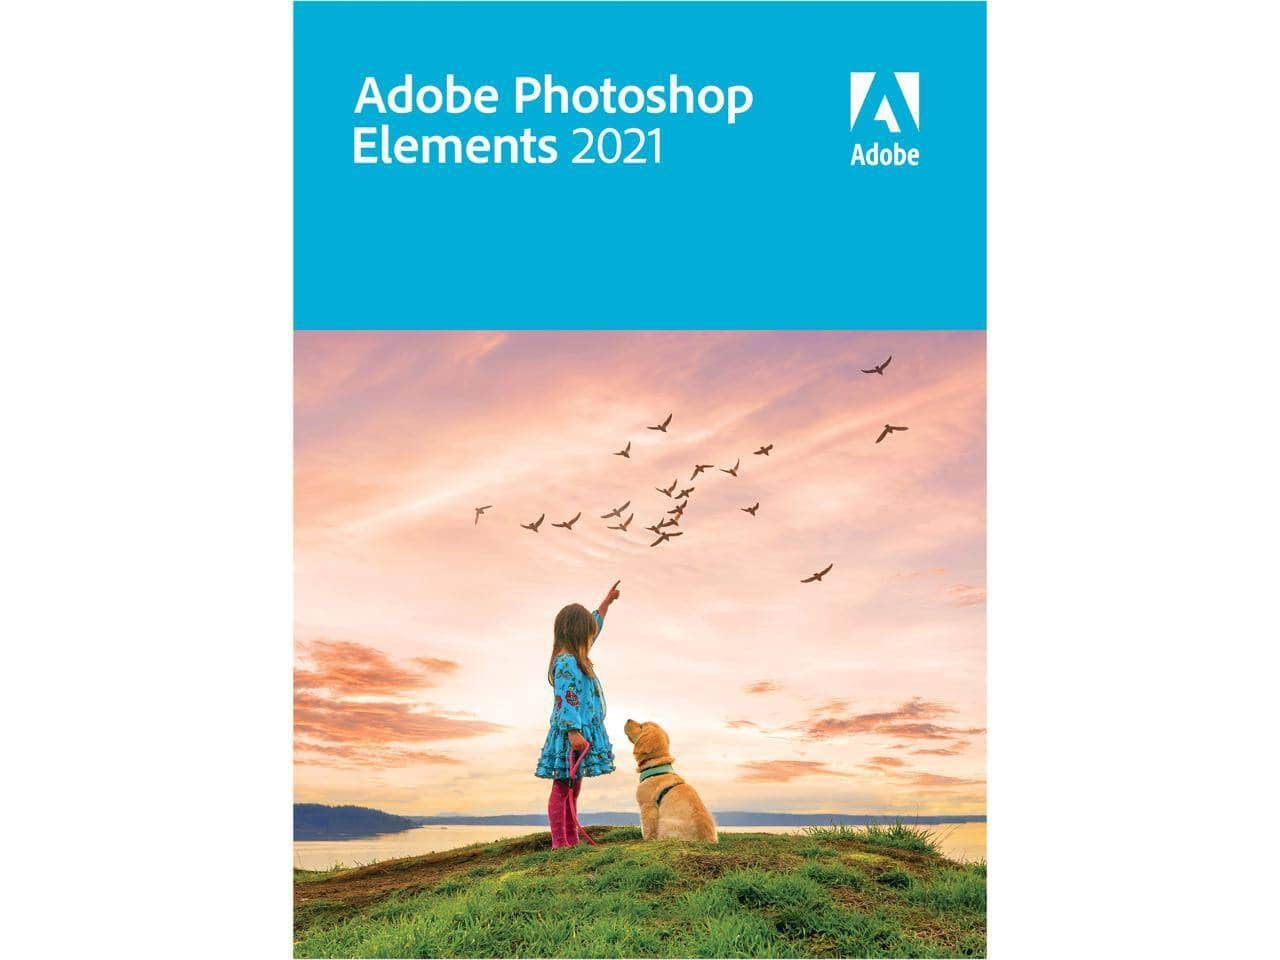 Adobe Photoshop Elements 2021 $49.99 AC, Adobe Photoshop & Premiere Elements Bundle 2021 - $69.99 AC & More